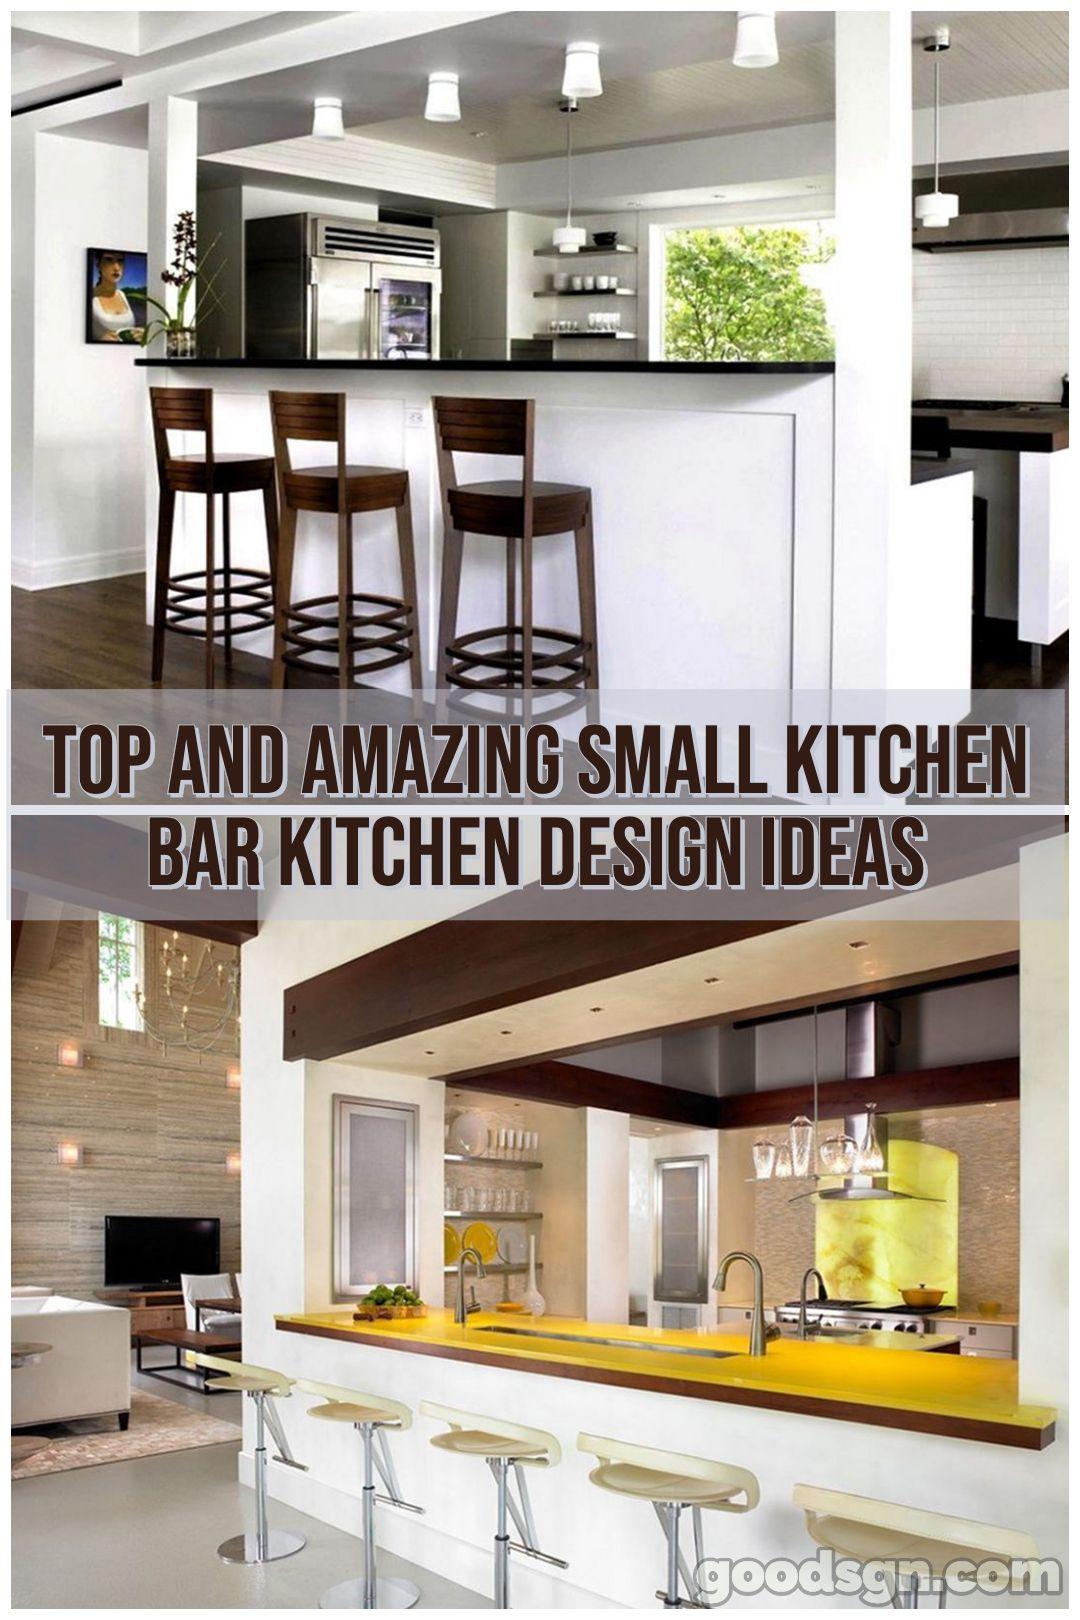 Pin by Felish Malcolm on Kitchen Ideas   Kitchen bar design ...